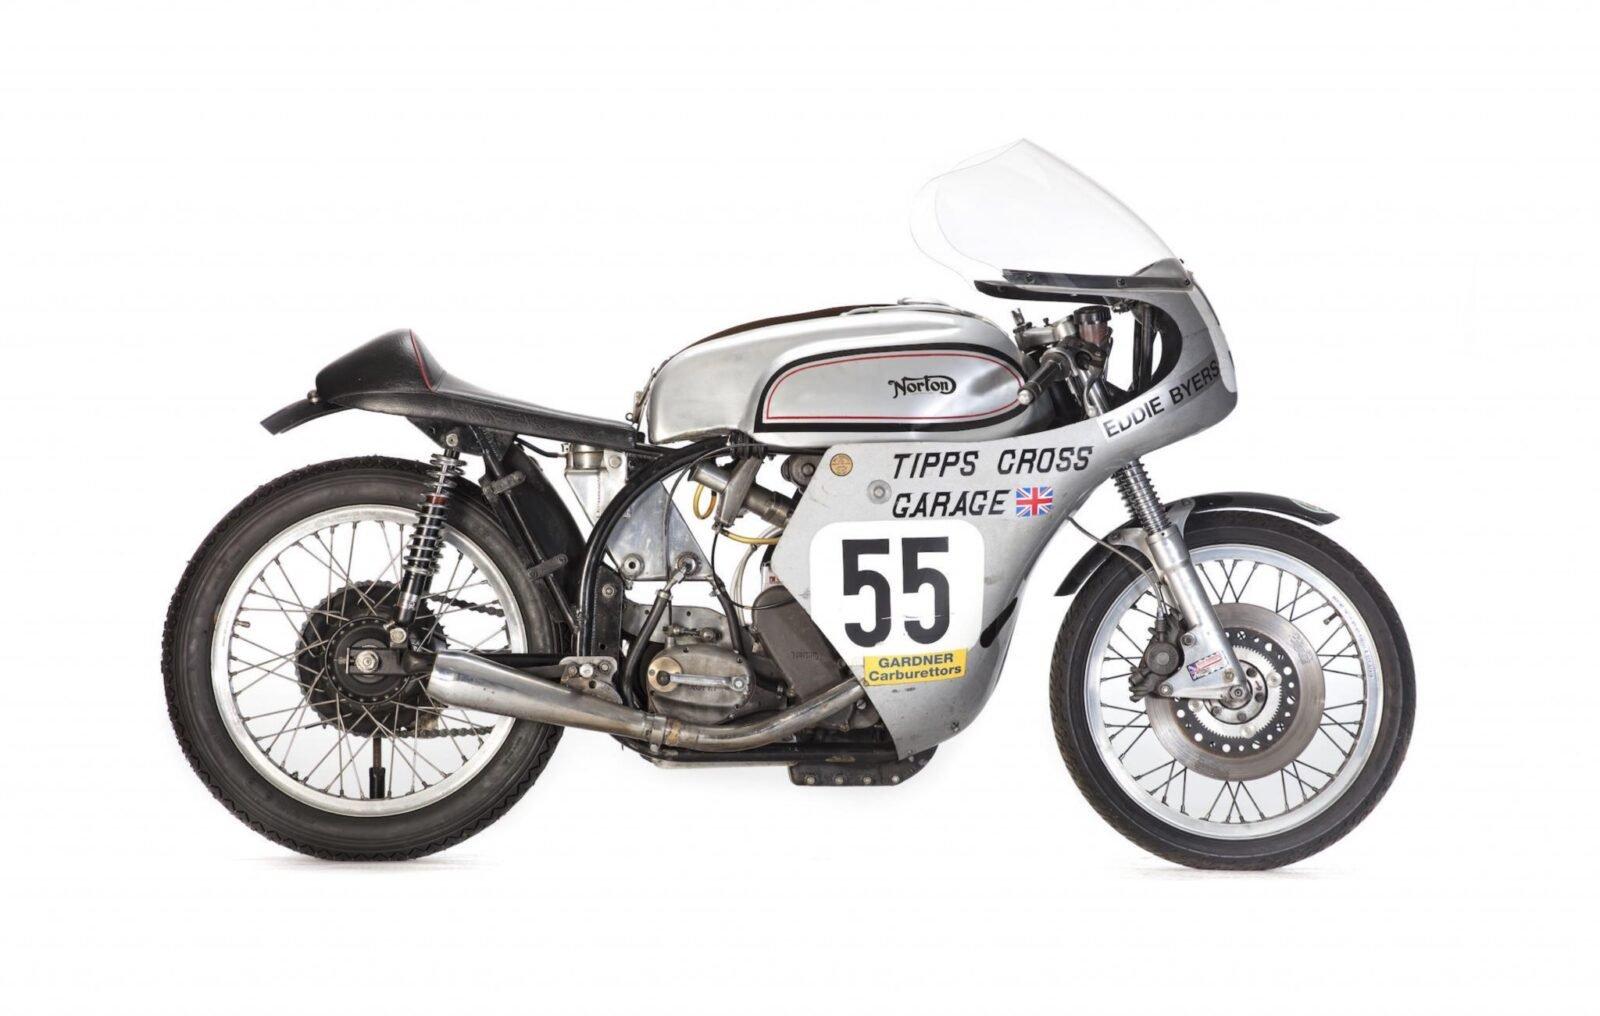 Norton Manx Racing Motorcycle 10 1600x1016 - Norton Manx